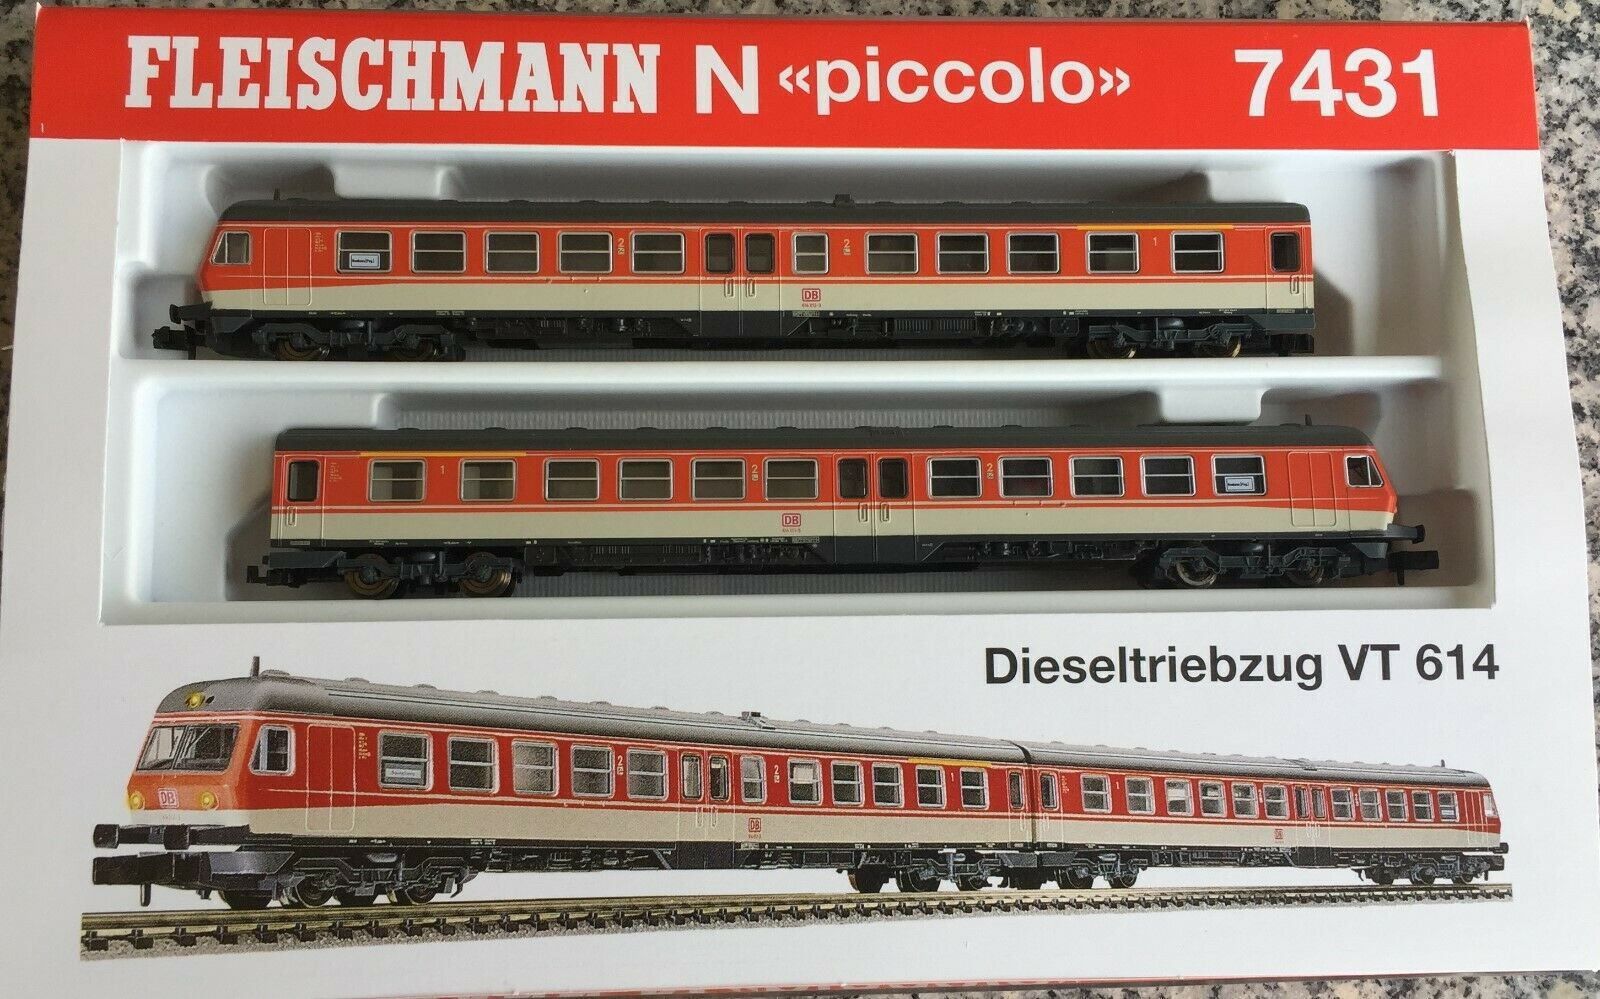 FLM 7431+7433 Dieseltriebwagen+Mittelwagen 3-teilig, BR. 614,kieselgrau Orange